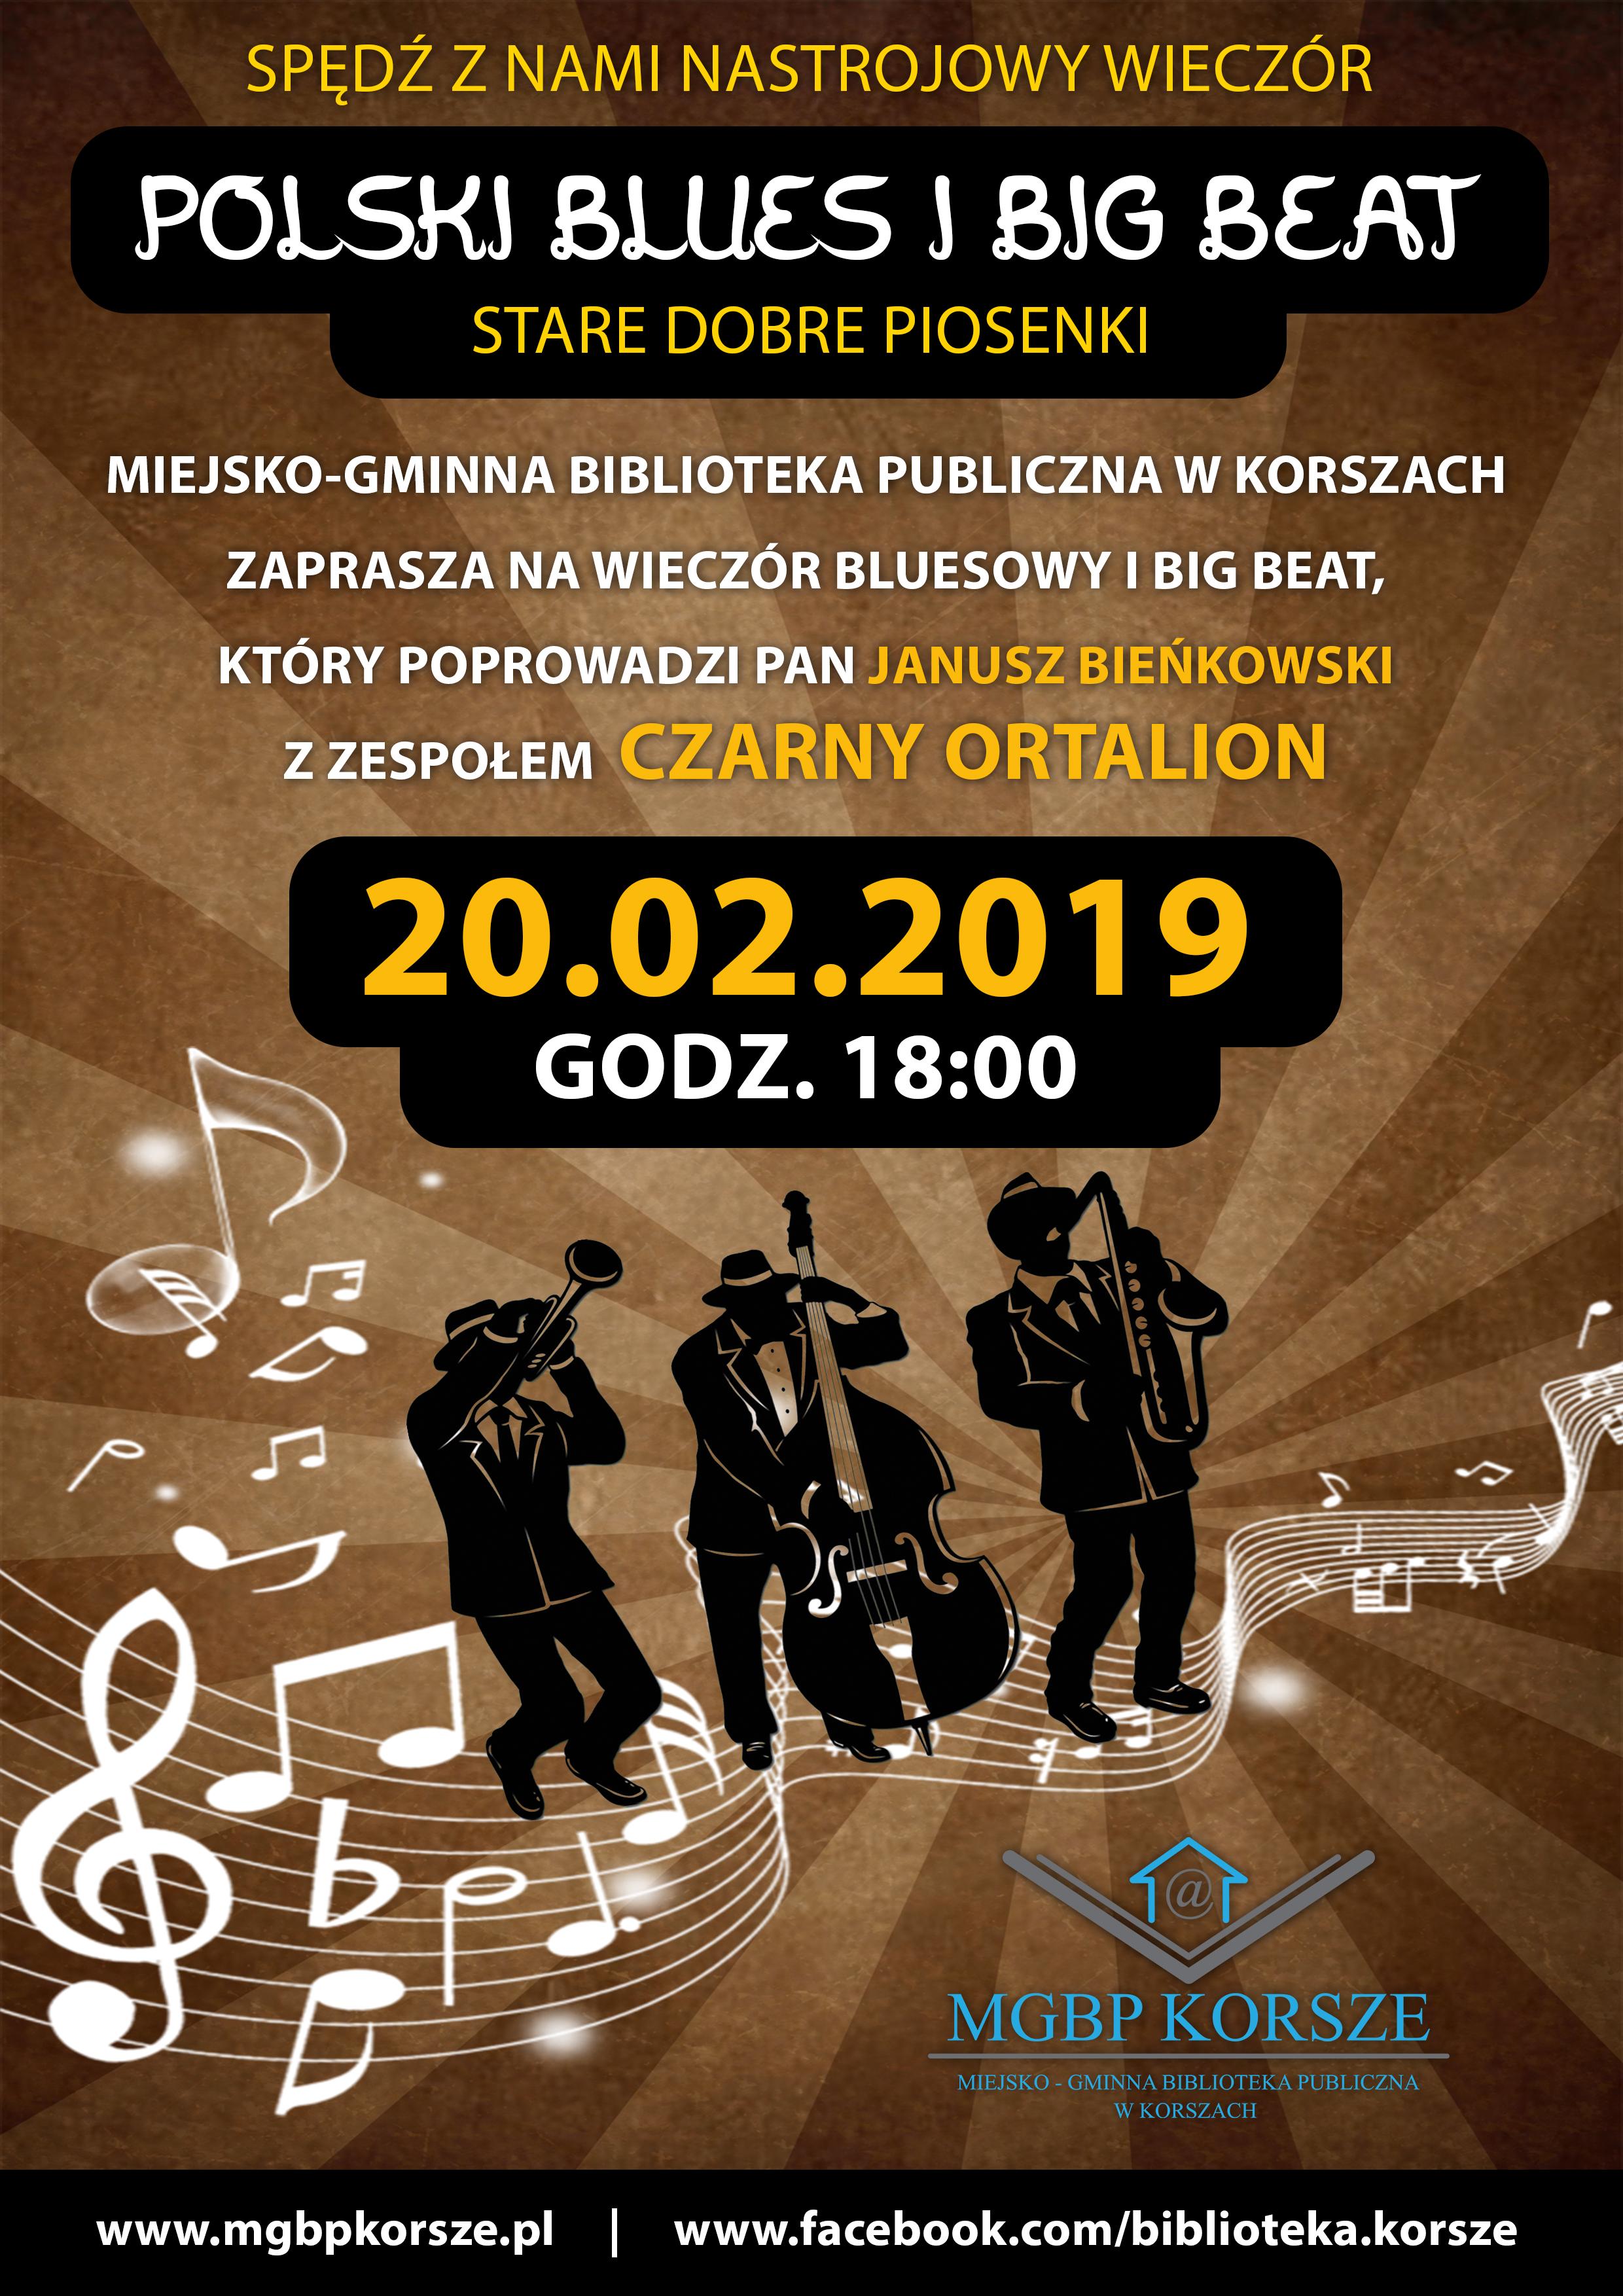 Ilustracja do informacji: POLSKI BLUES I BIG BEAT - STARE DOBRE PIOSENKI